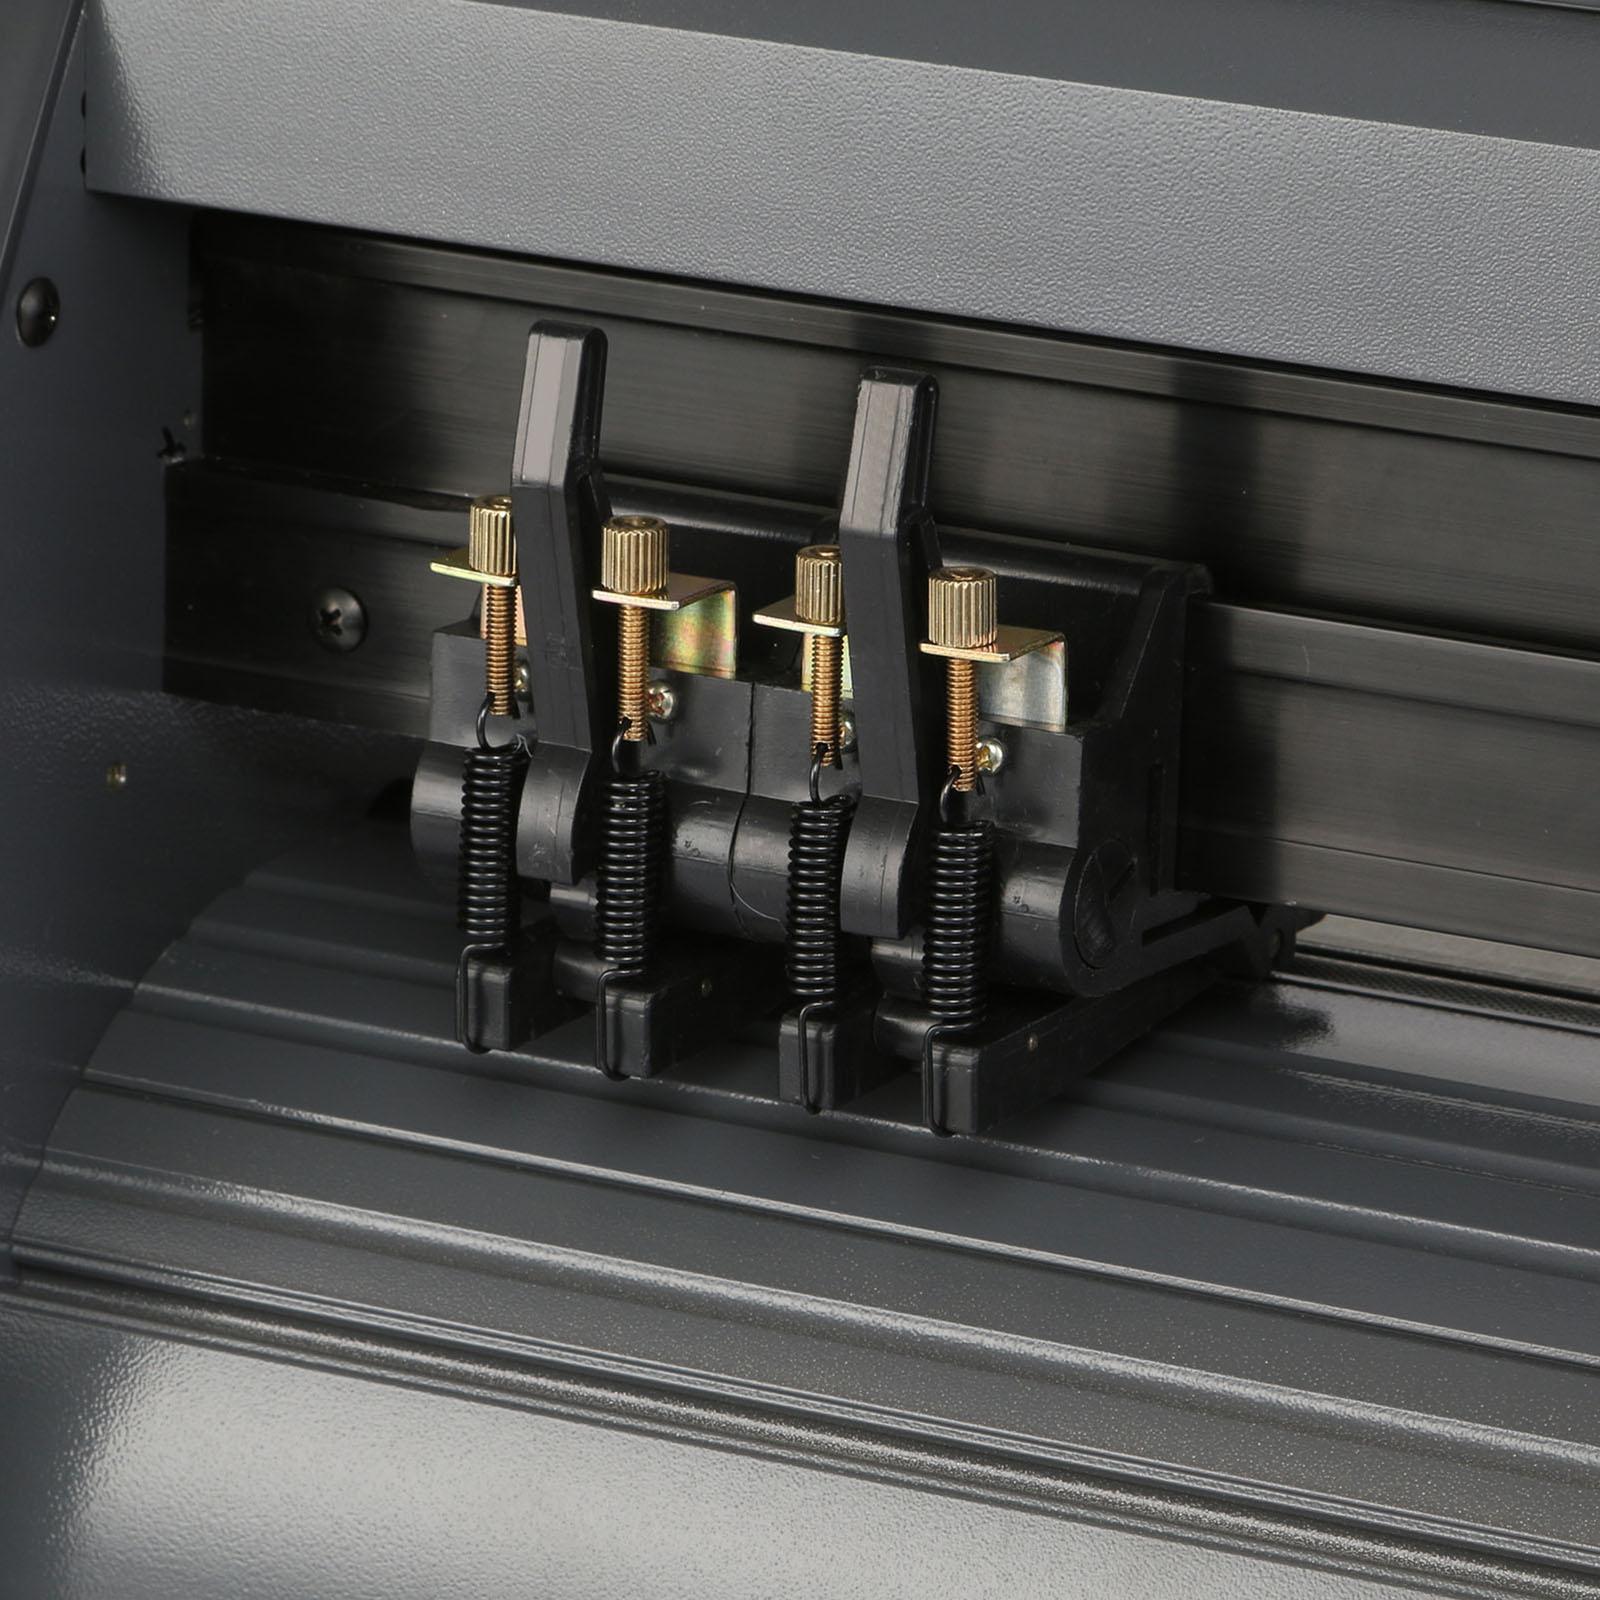 5in1 Heat Press Transfer Vinyl Cutting Plotter T Shirt